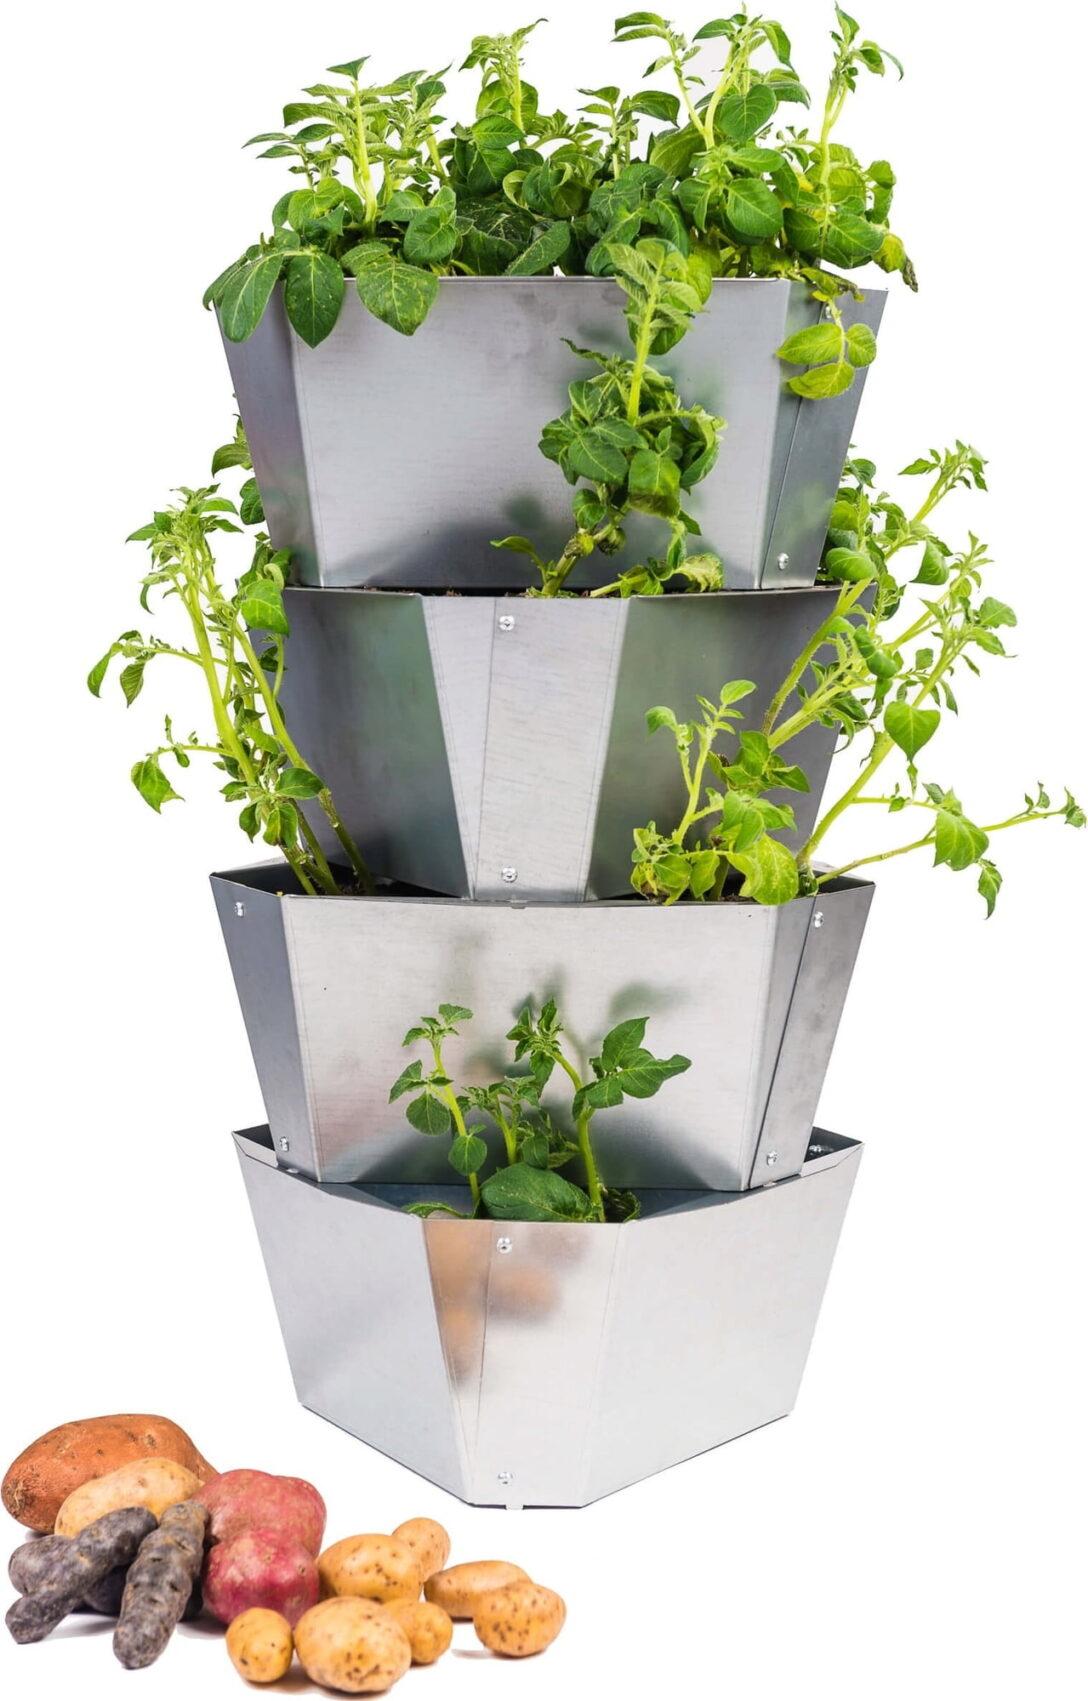 Paul Potato Kartoffelturm Erfahrungen Gusta Garden Starter Aus Stahl 4 Etagen Bloomling